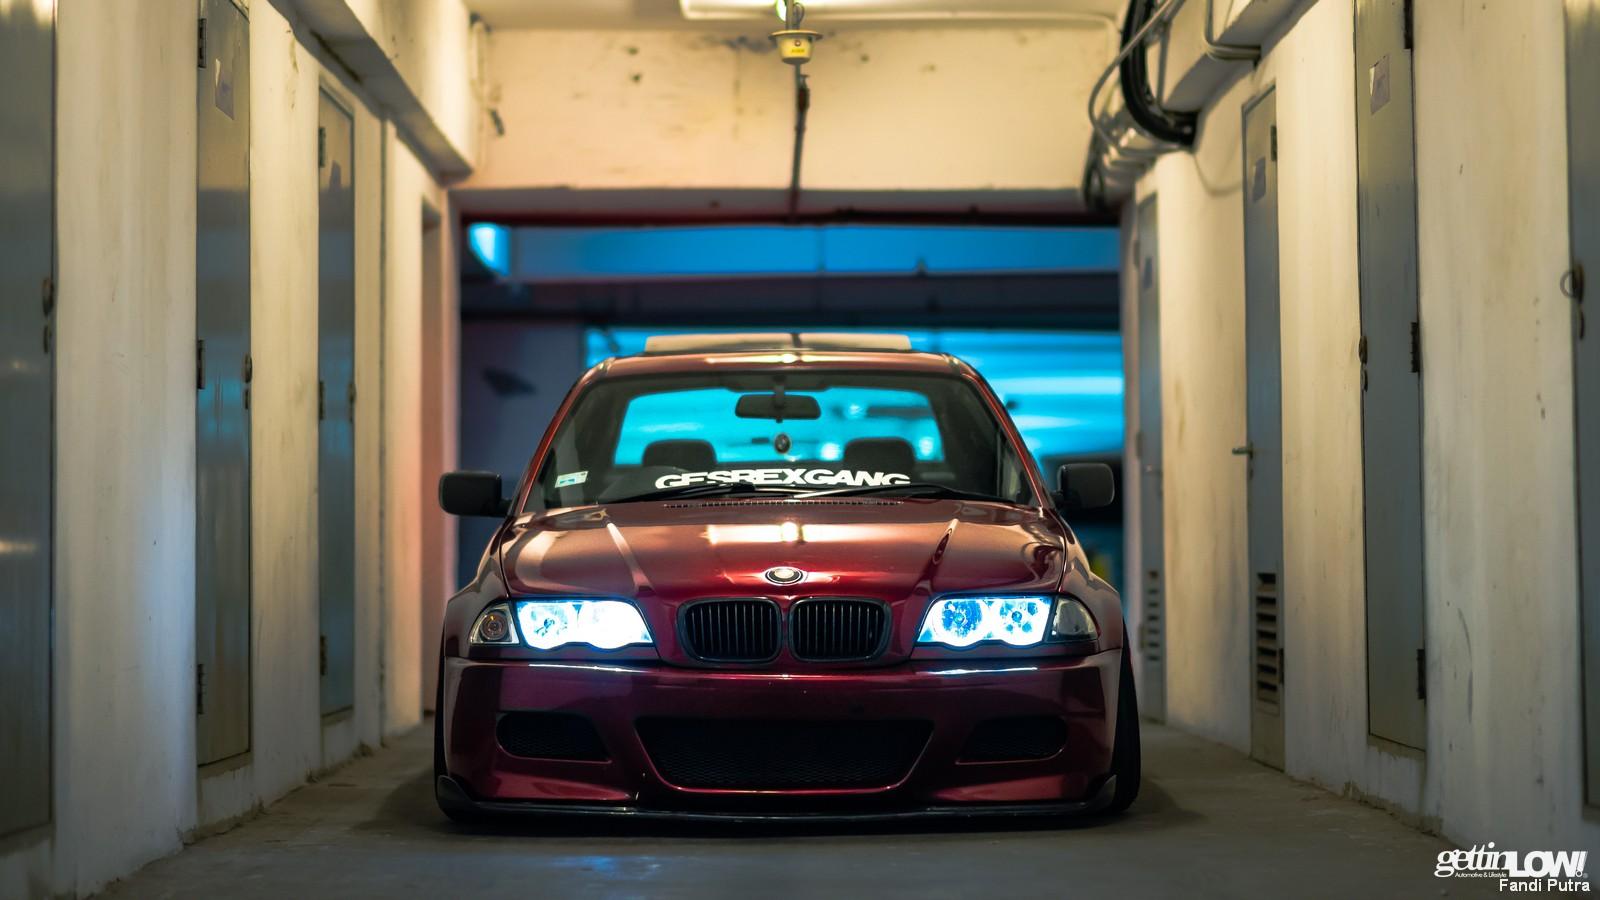 BMW-Maroon-gesrex_01